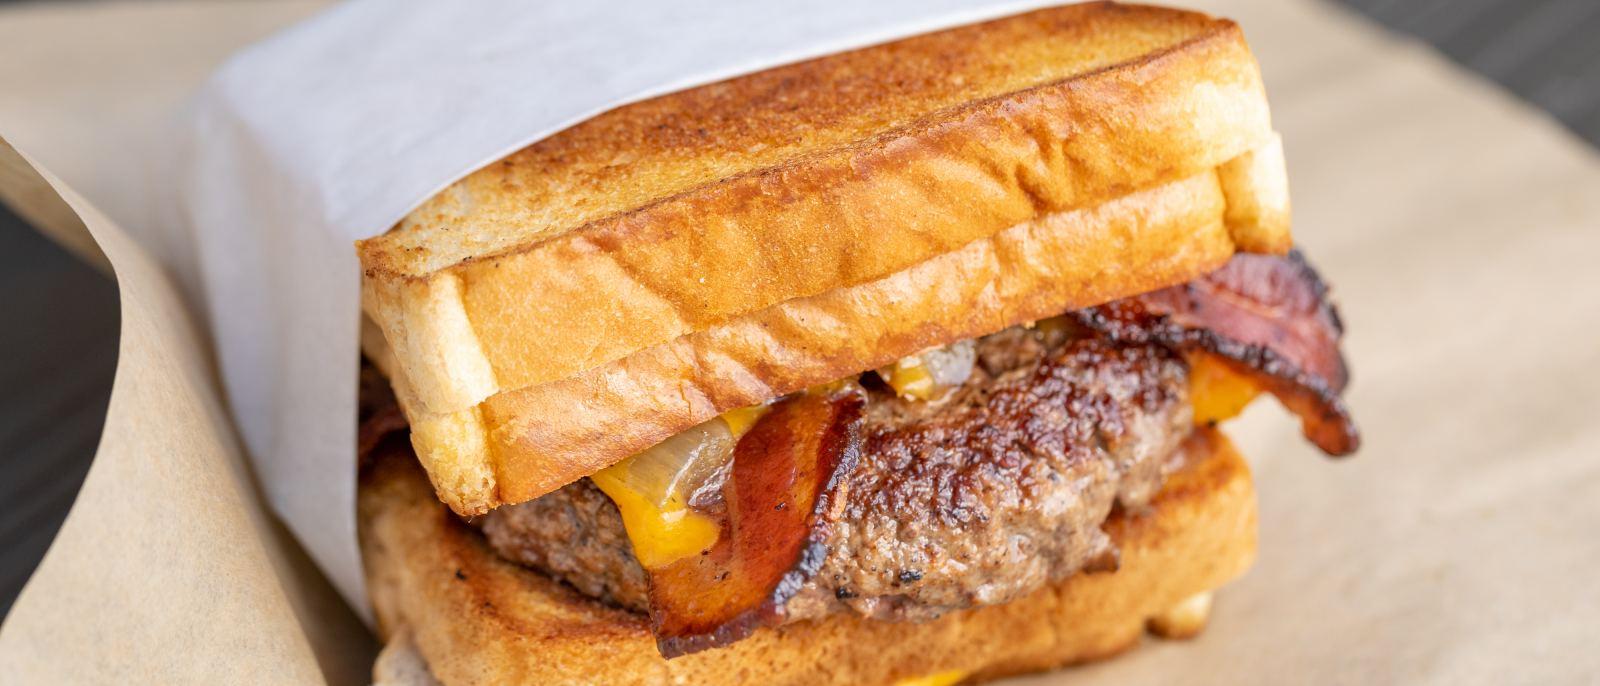 Behemoth Burger at Grill 'Em All in Alhambra